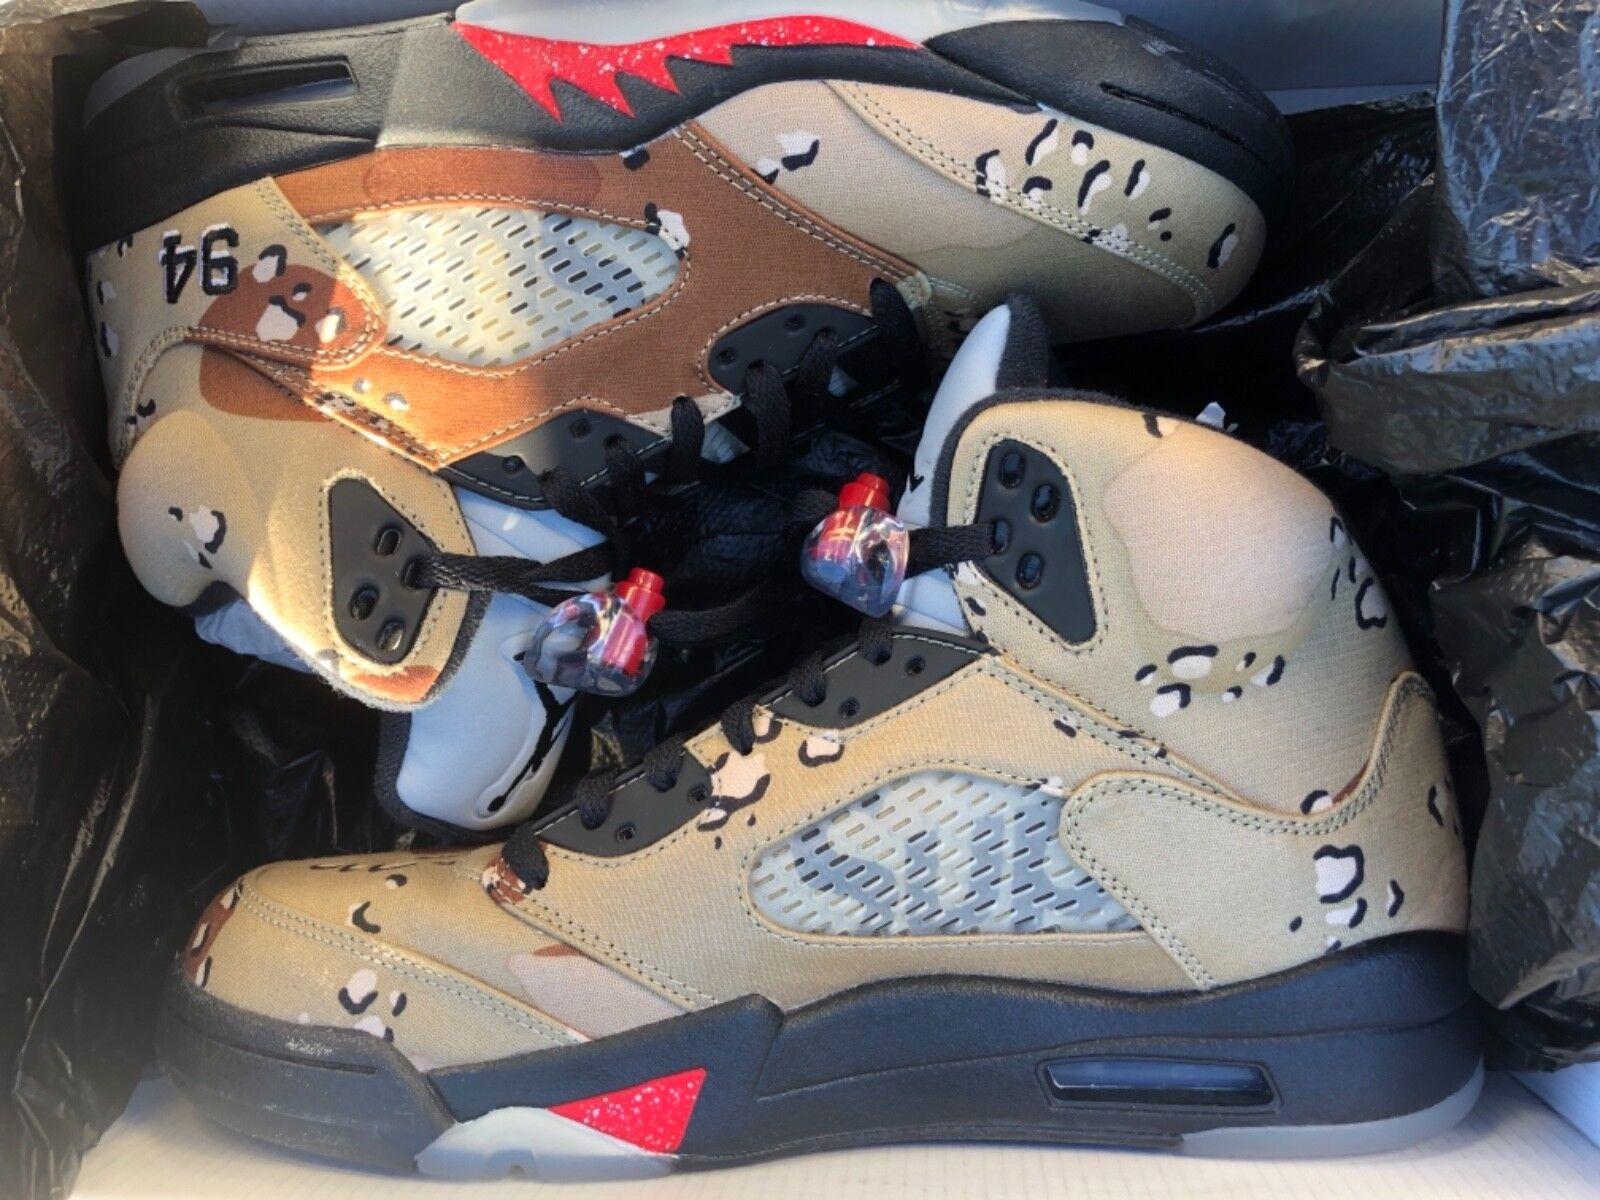 Air Jordan Retro 5 Supreme Desert Camo size 8.5